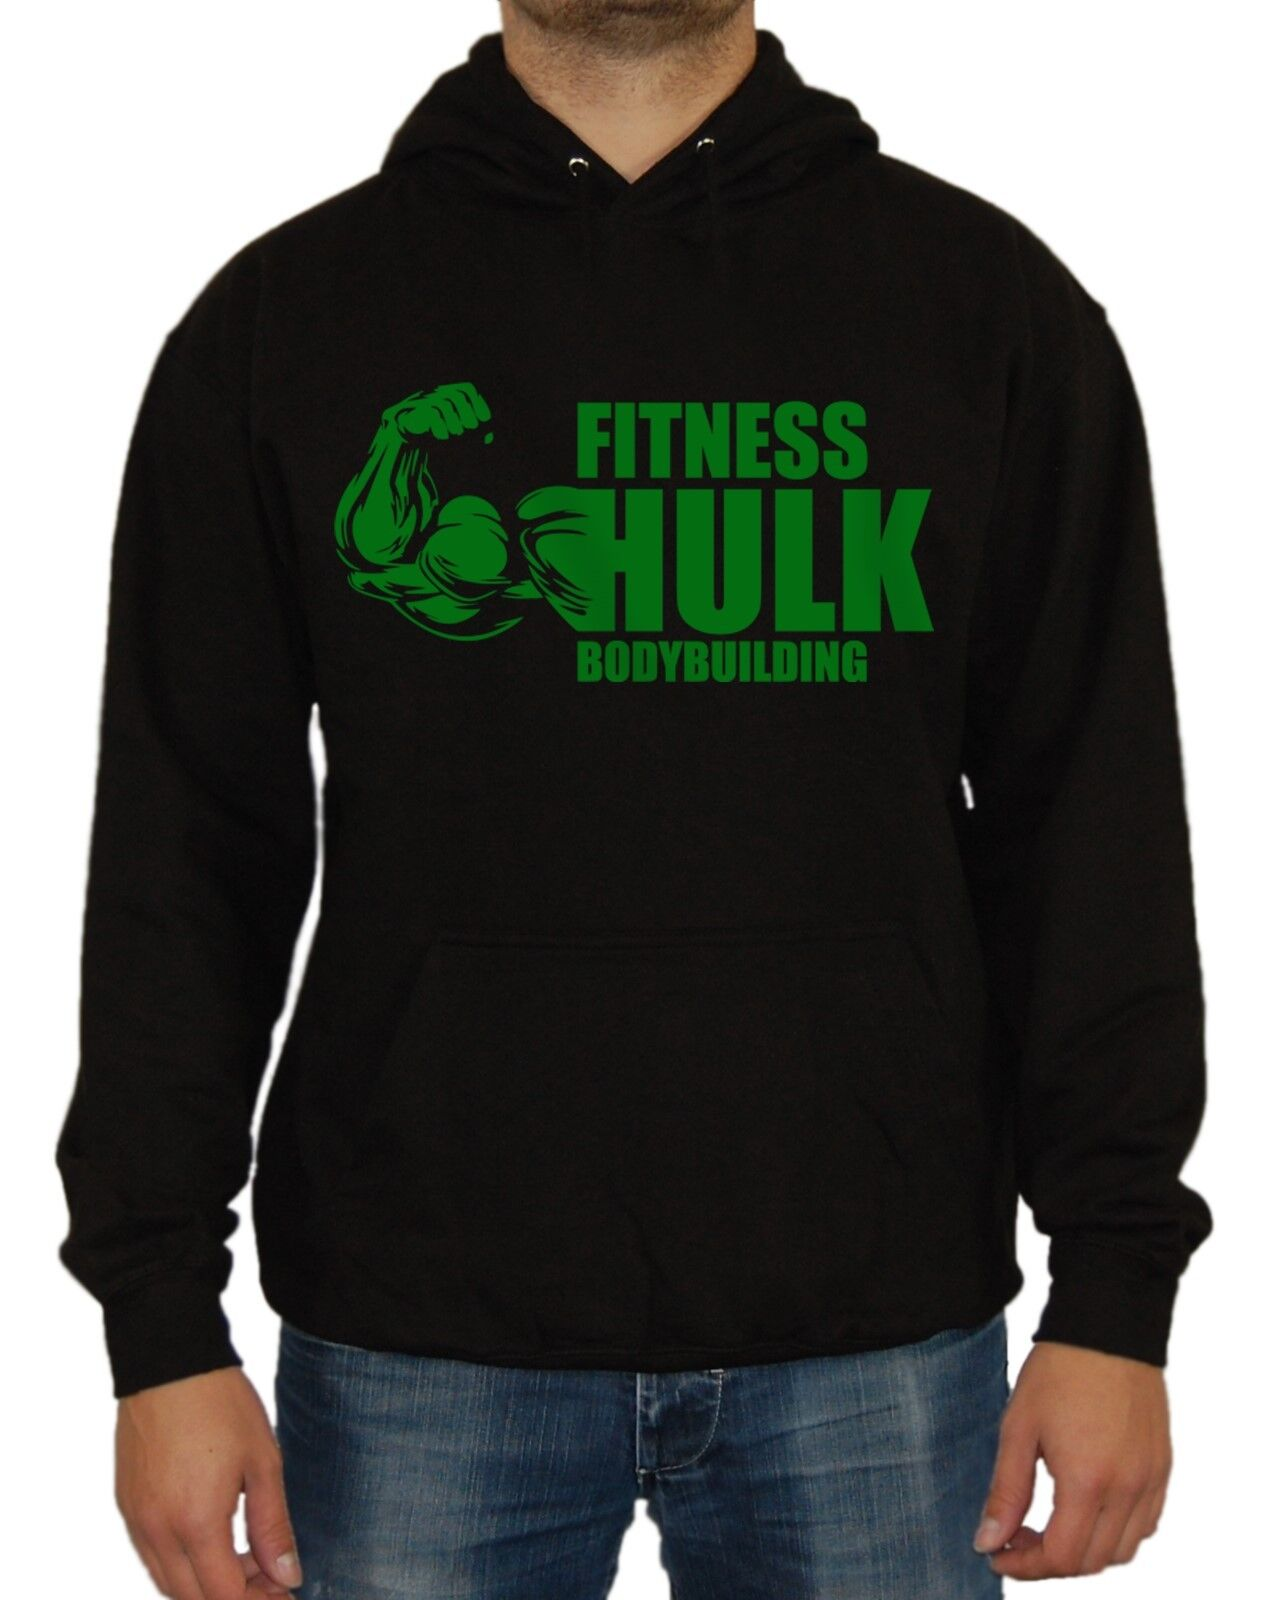 Fitness Hulk Kapu Fun Comic Kult Superheld Film Iron Captian Batman Avengers